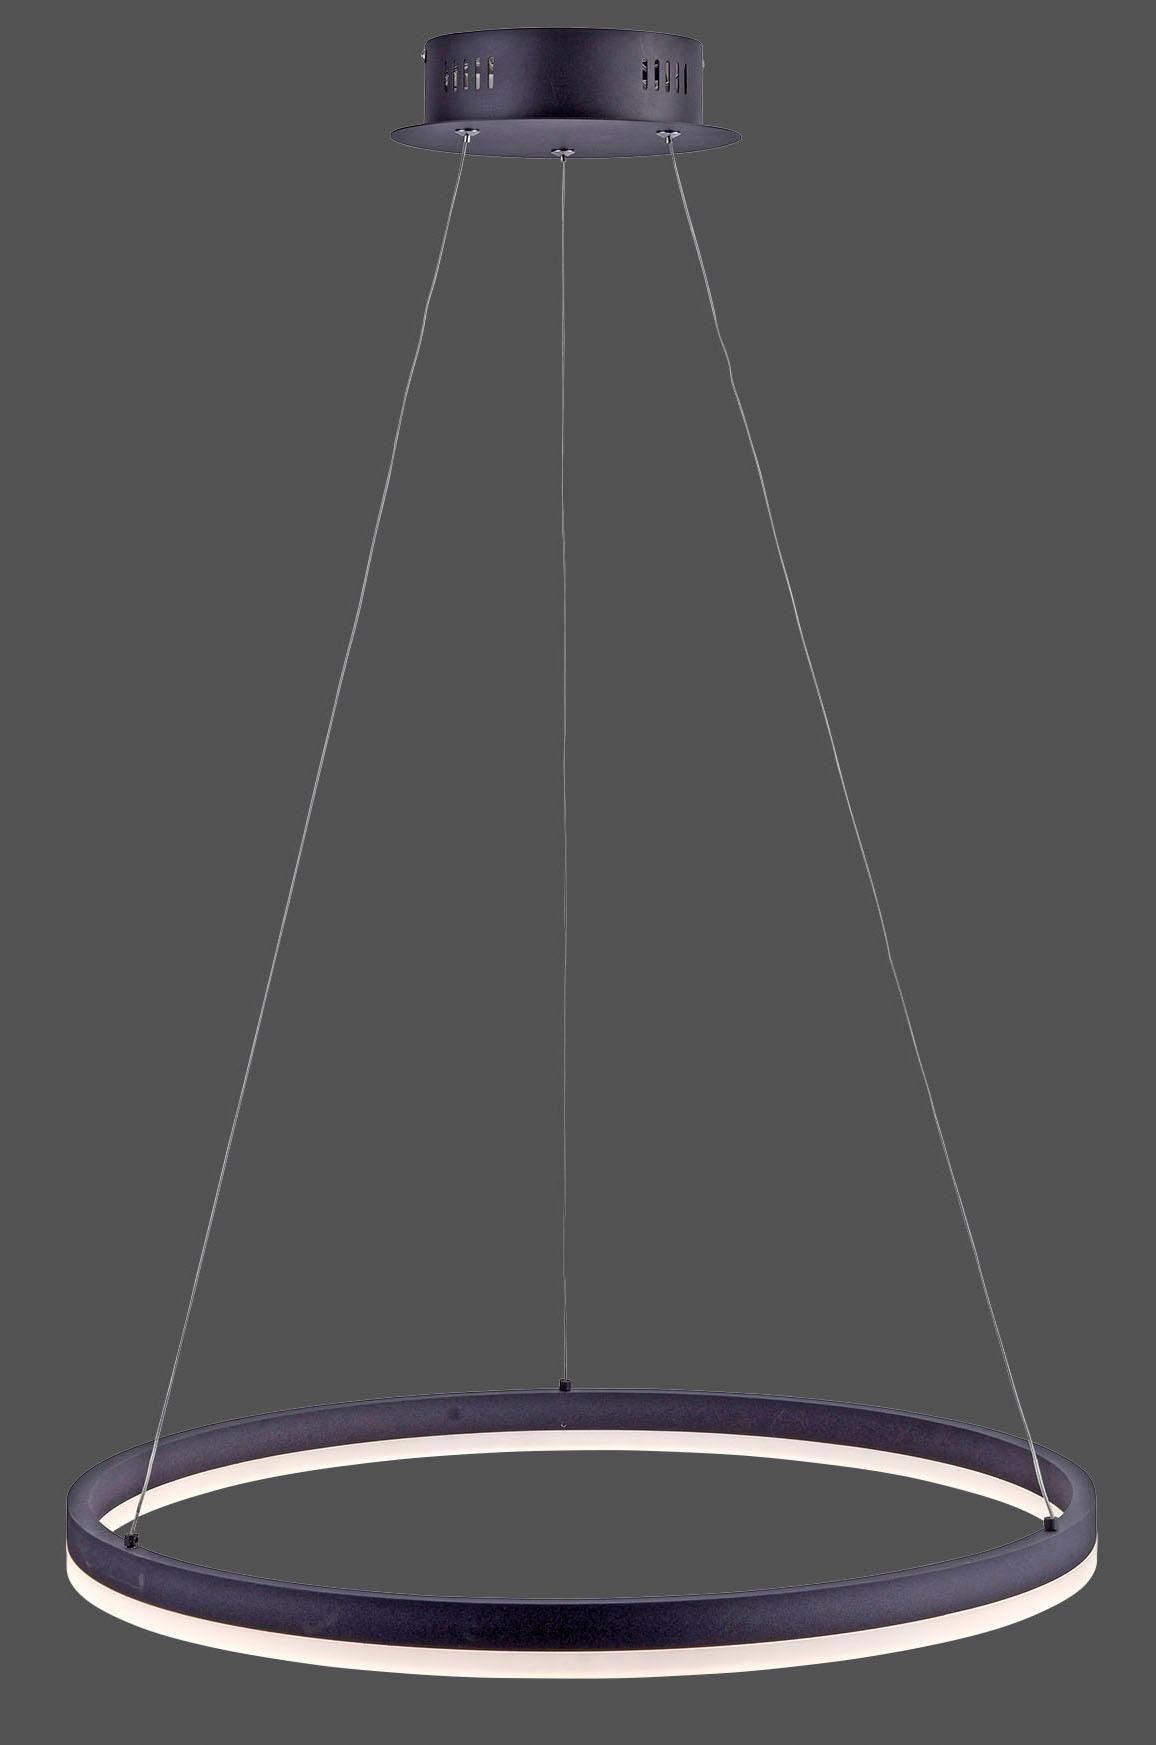 Full Size of Moderne Hngeleuchten Wohnzimmer Holz Pendelleuchten Fototapeten Stehlampe Poster Vitrine Weiß Led Beleuchtung Wandbild Deckenleuchte Wandtattoos Rollo Wohnzimmer Wohnzimmer Hängelampe